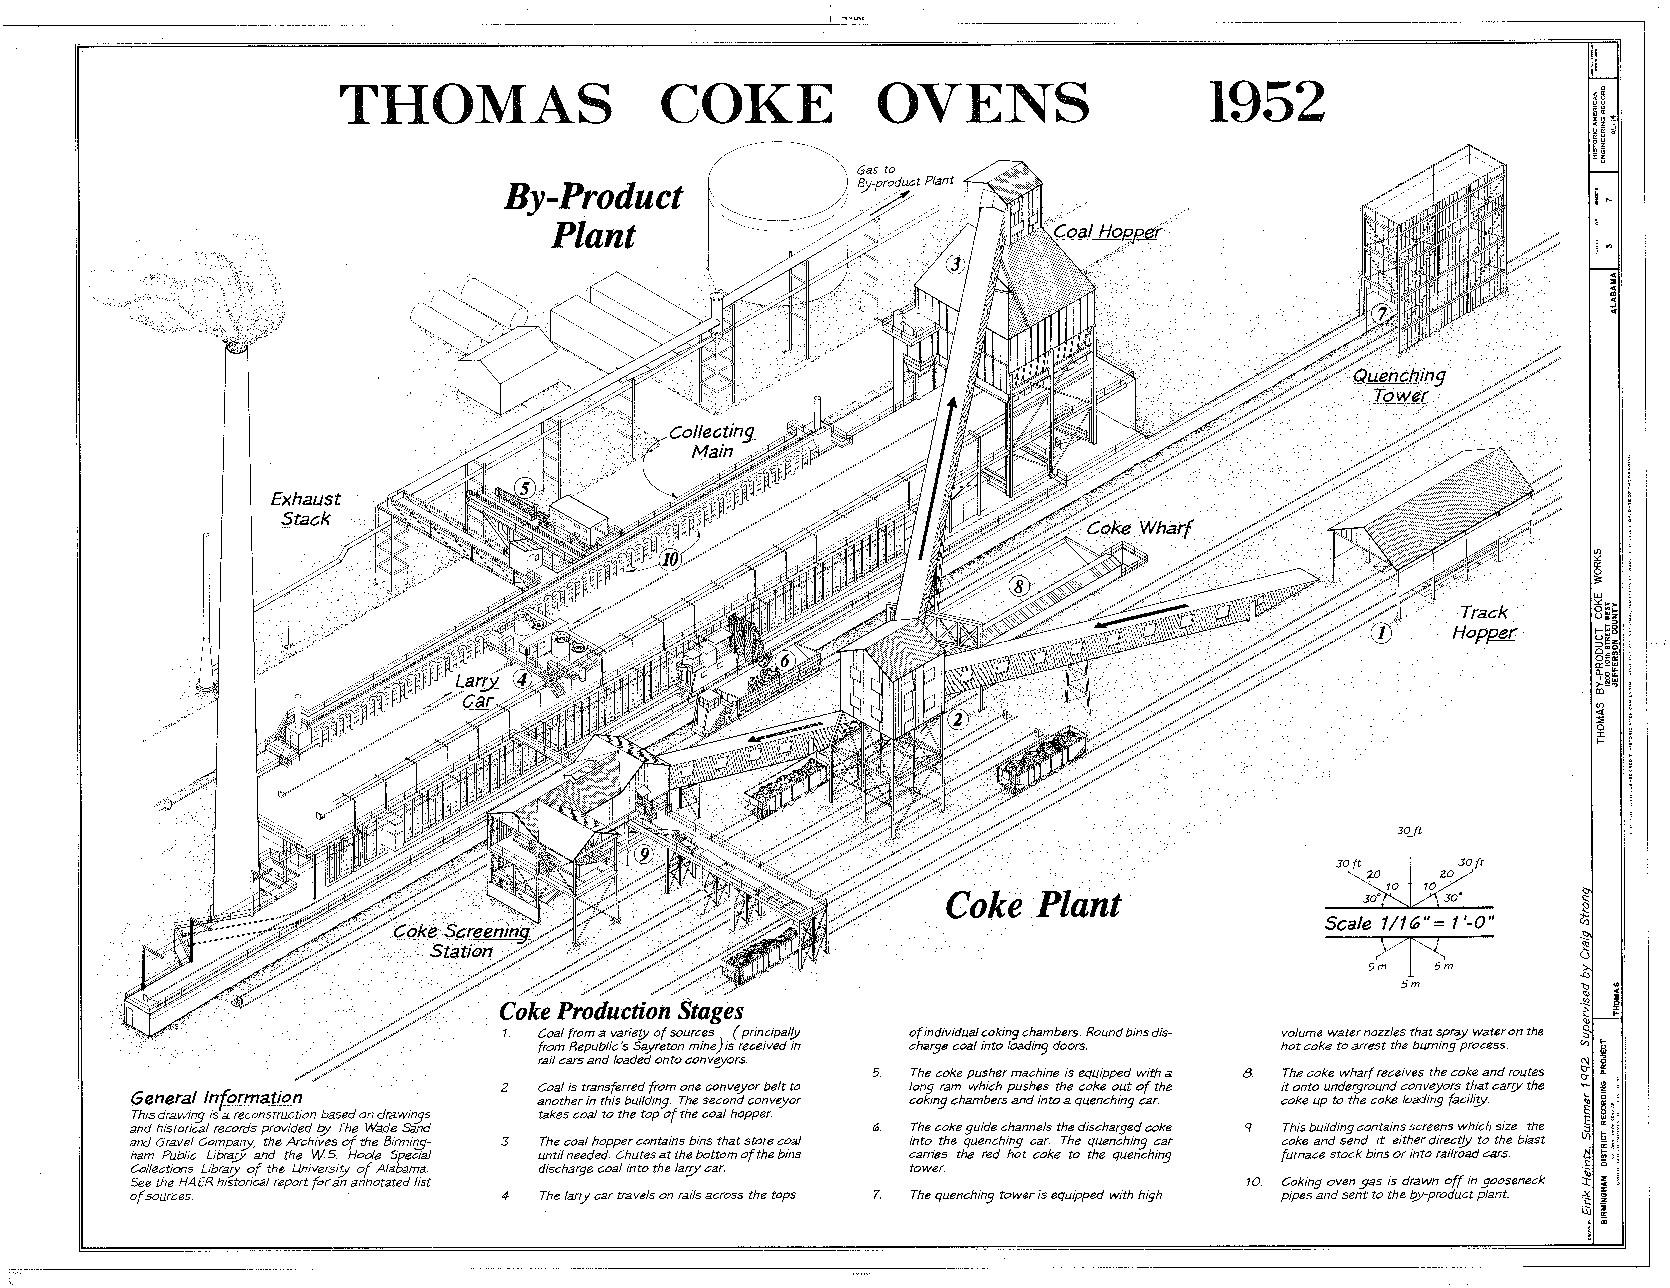 1952 Coke Plant Diagram. (Public domain record)